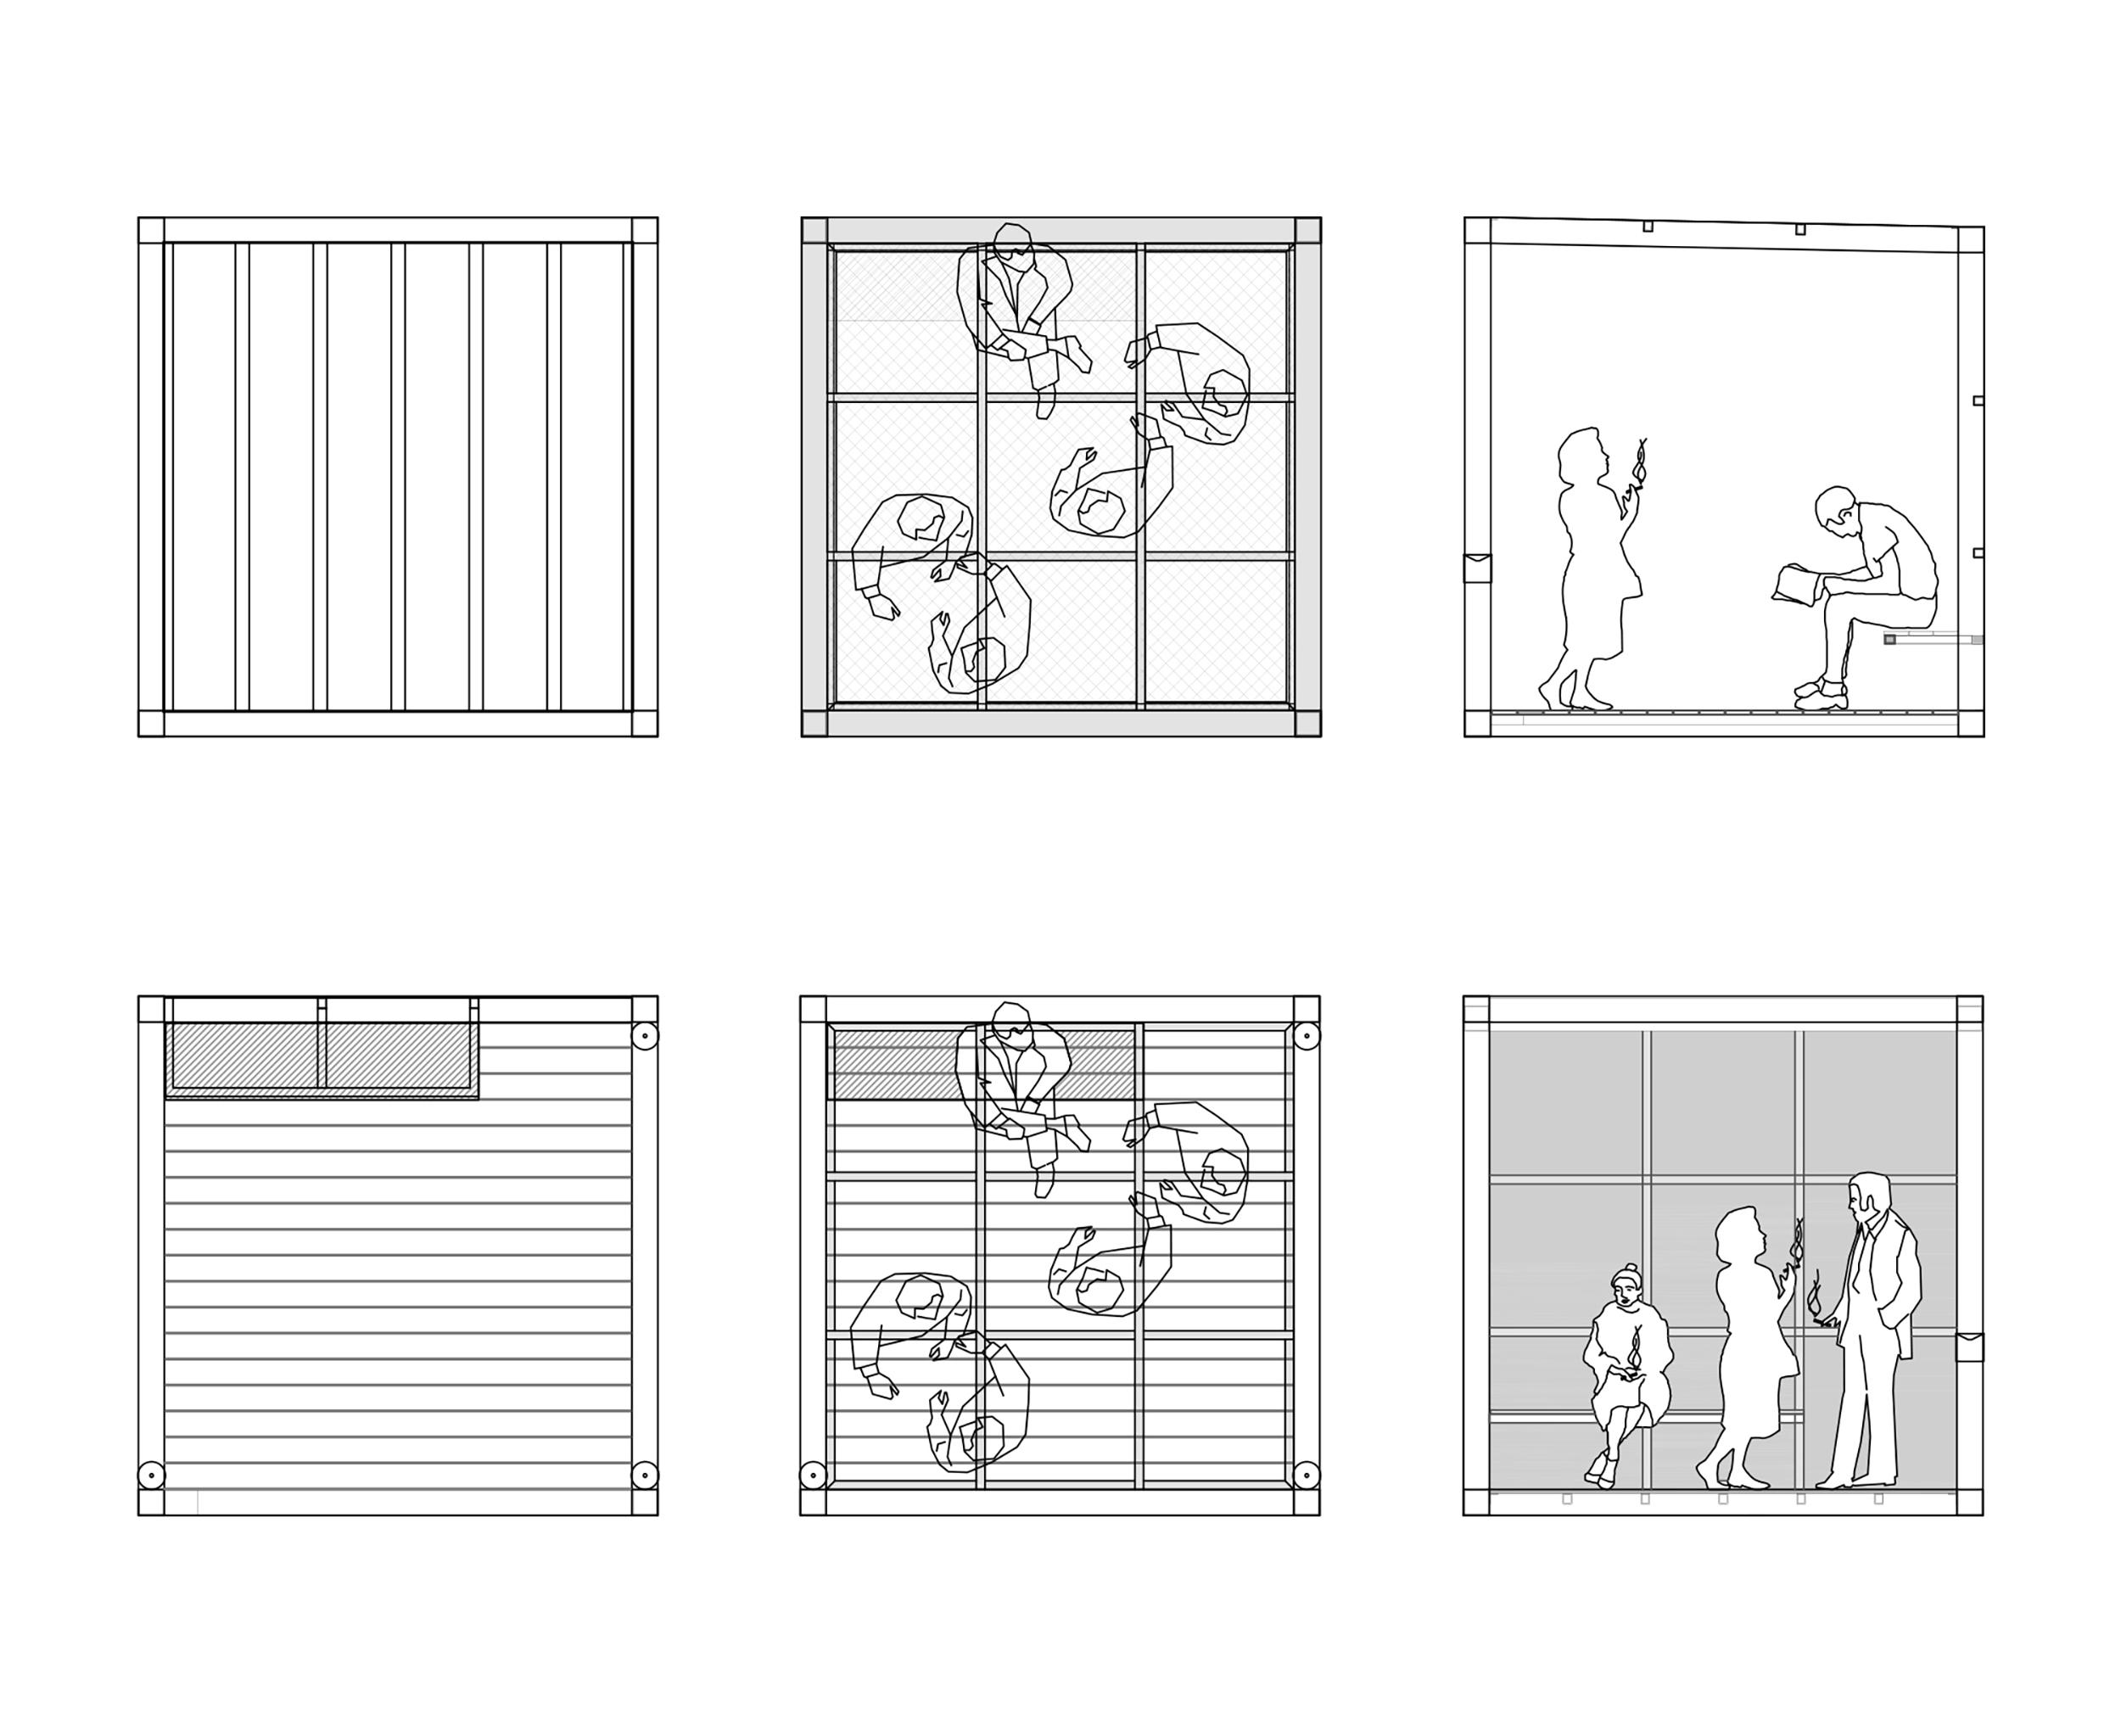 mobitel bruto ljubljana modular pavilion modularni pavilijon